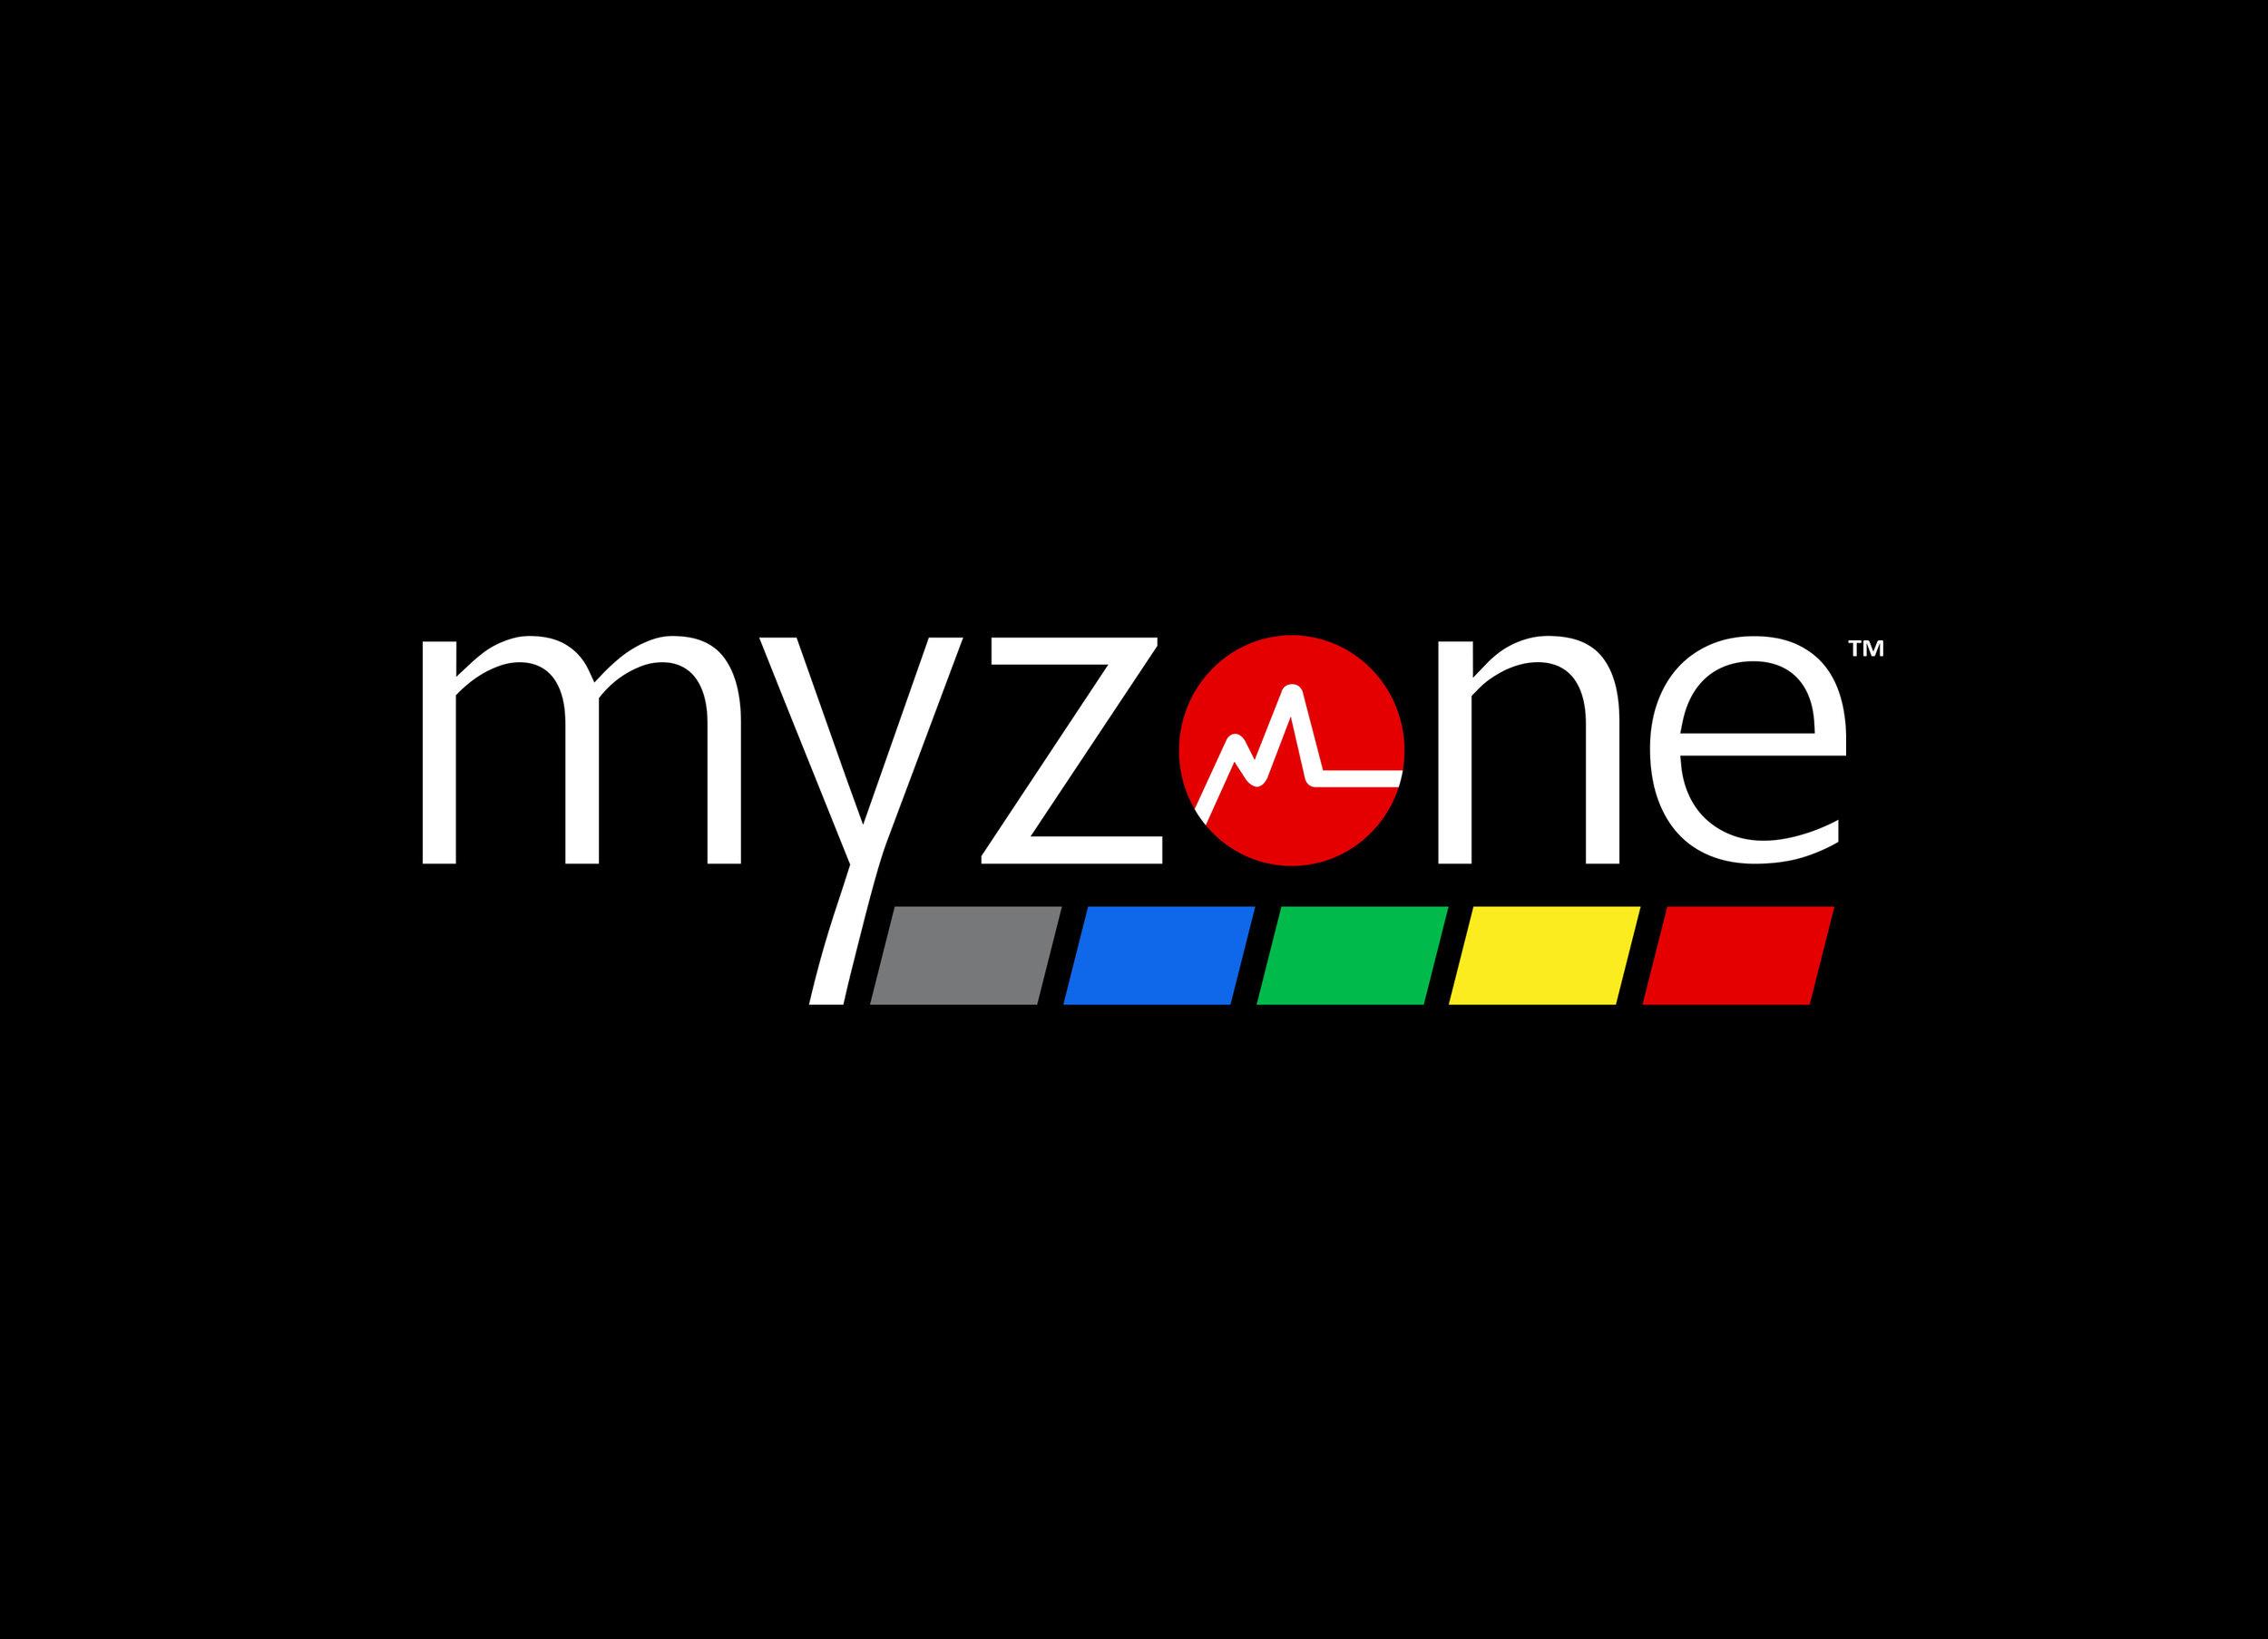 myzone company-logo,-fonts_3000x2168 (1).jpg